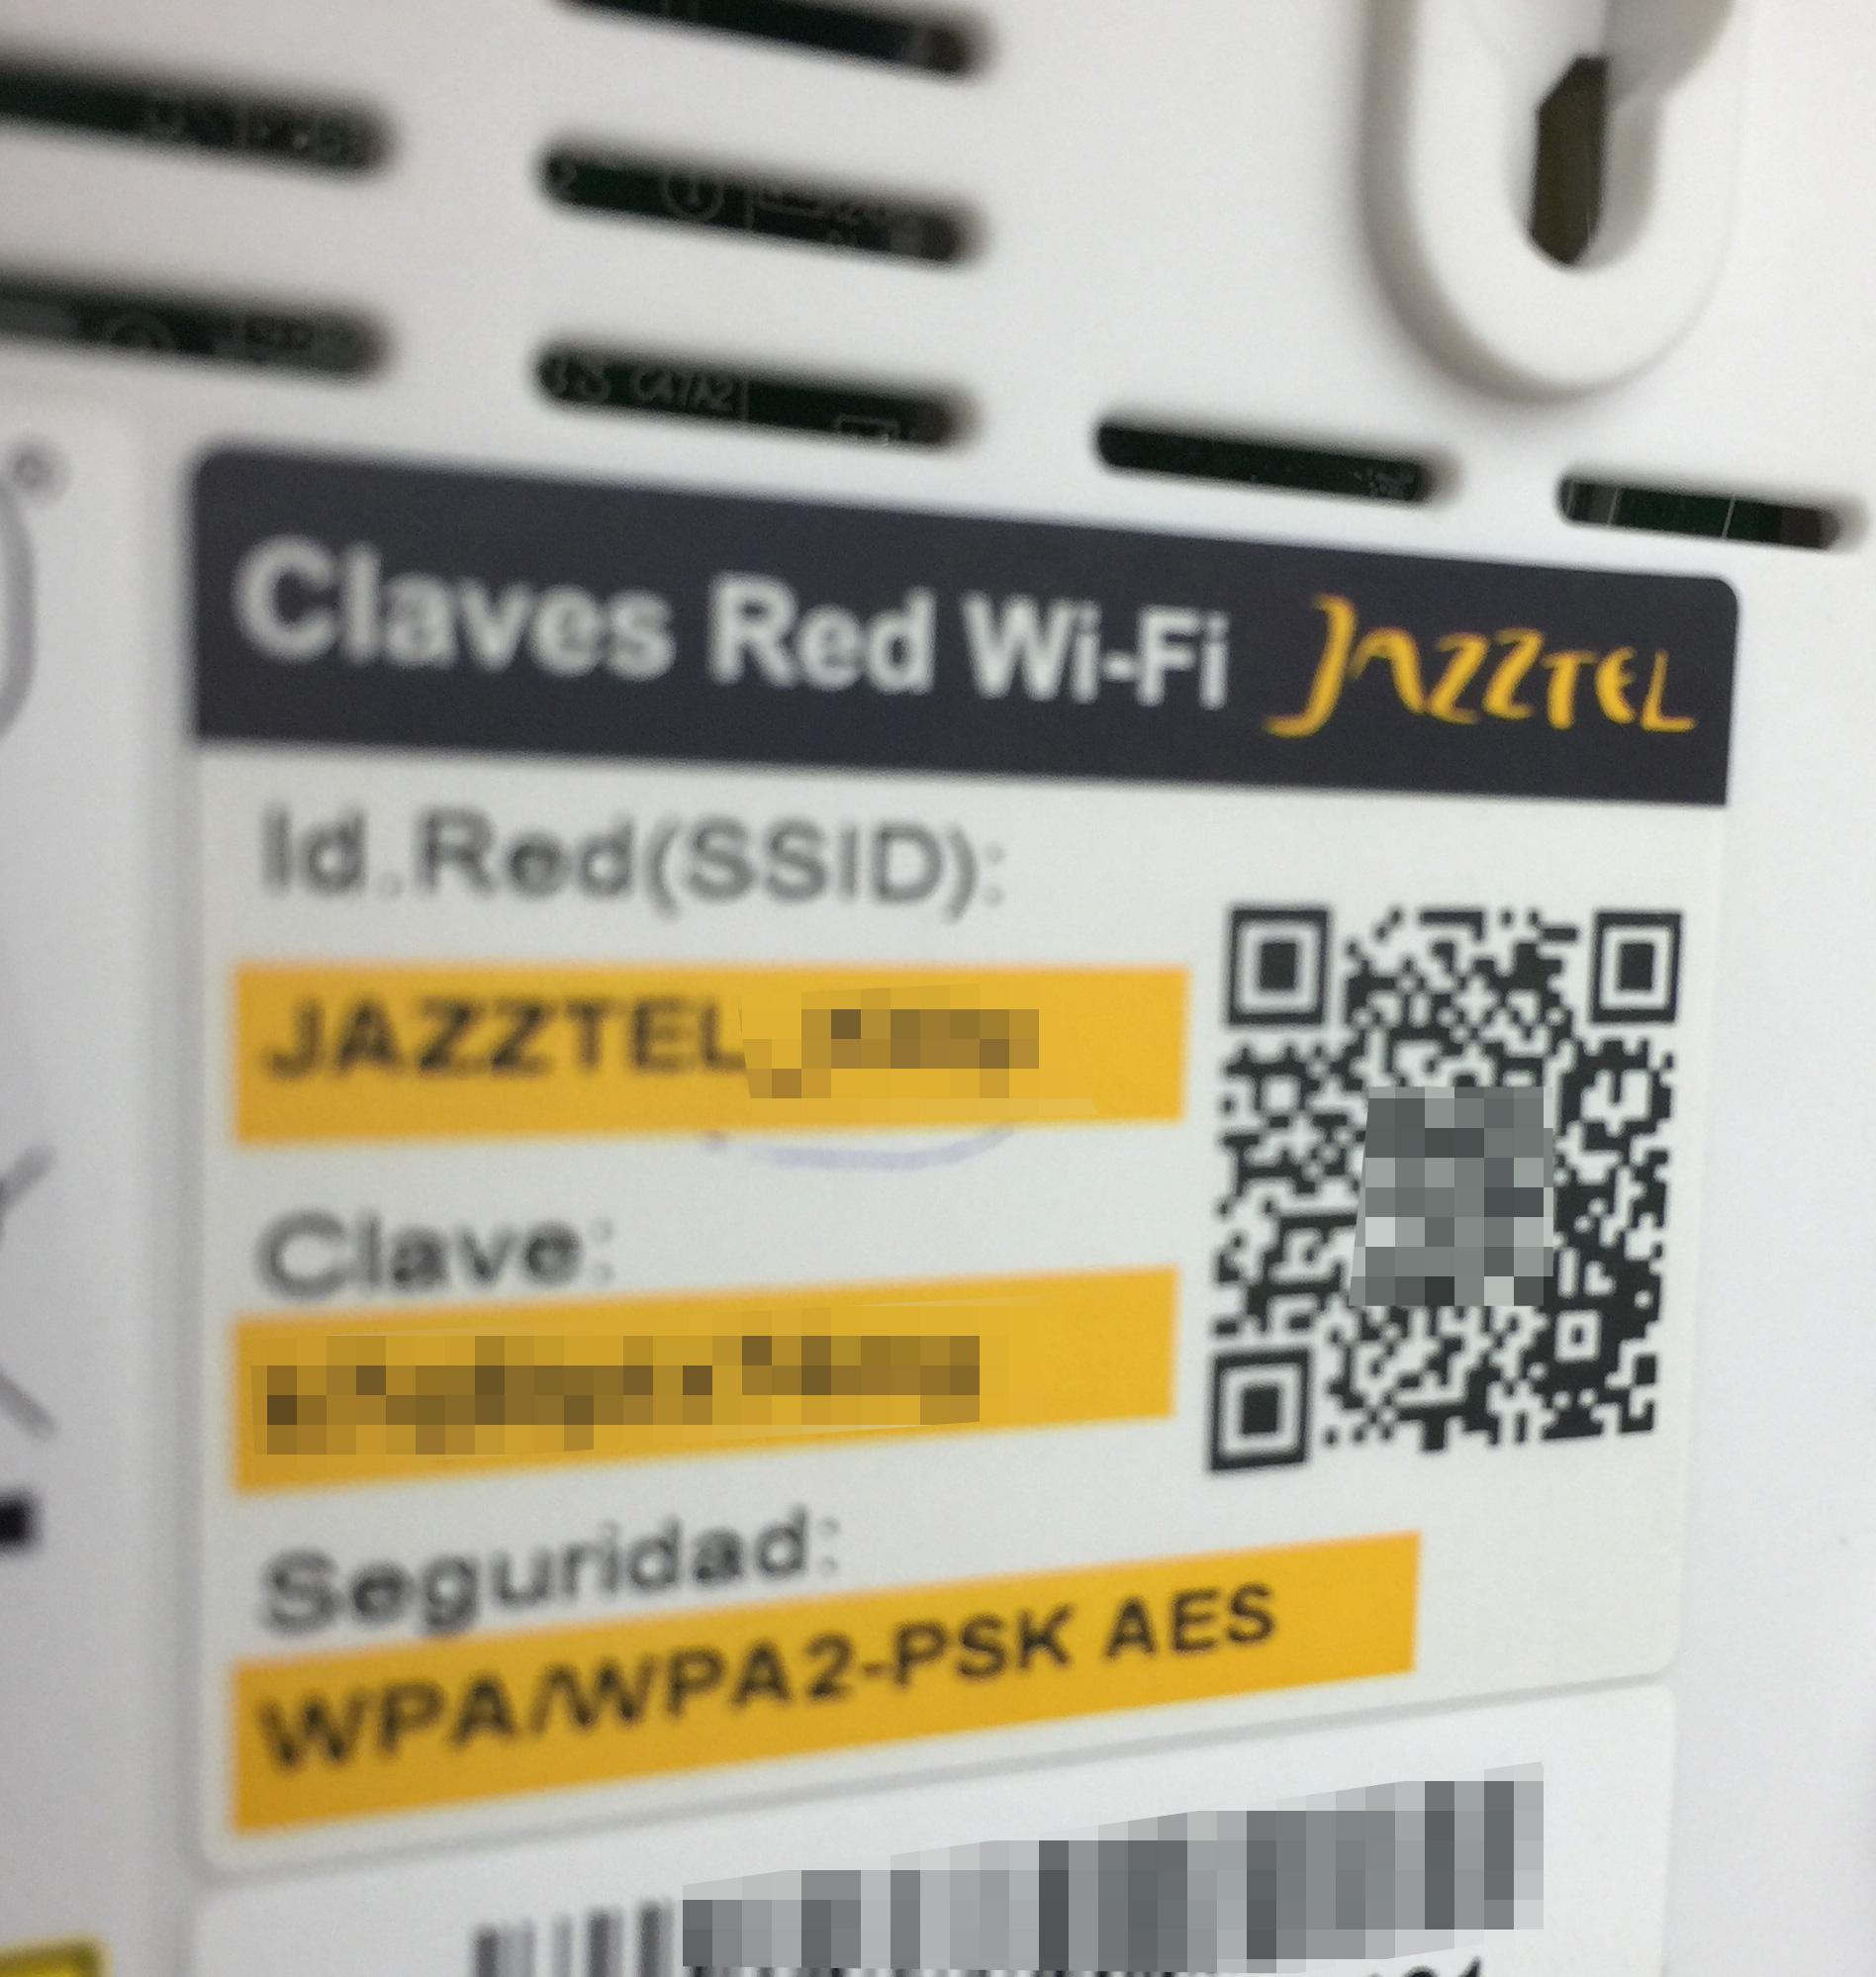 Claves Wi-Fi en un router, adquirible con un código QR